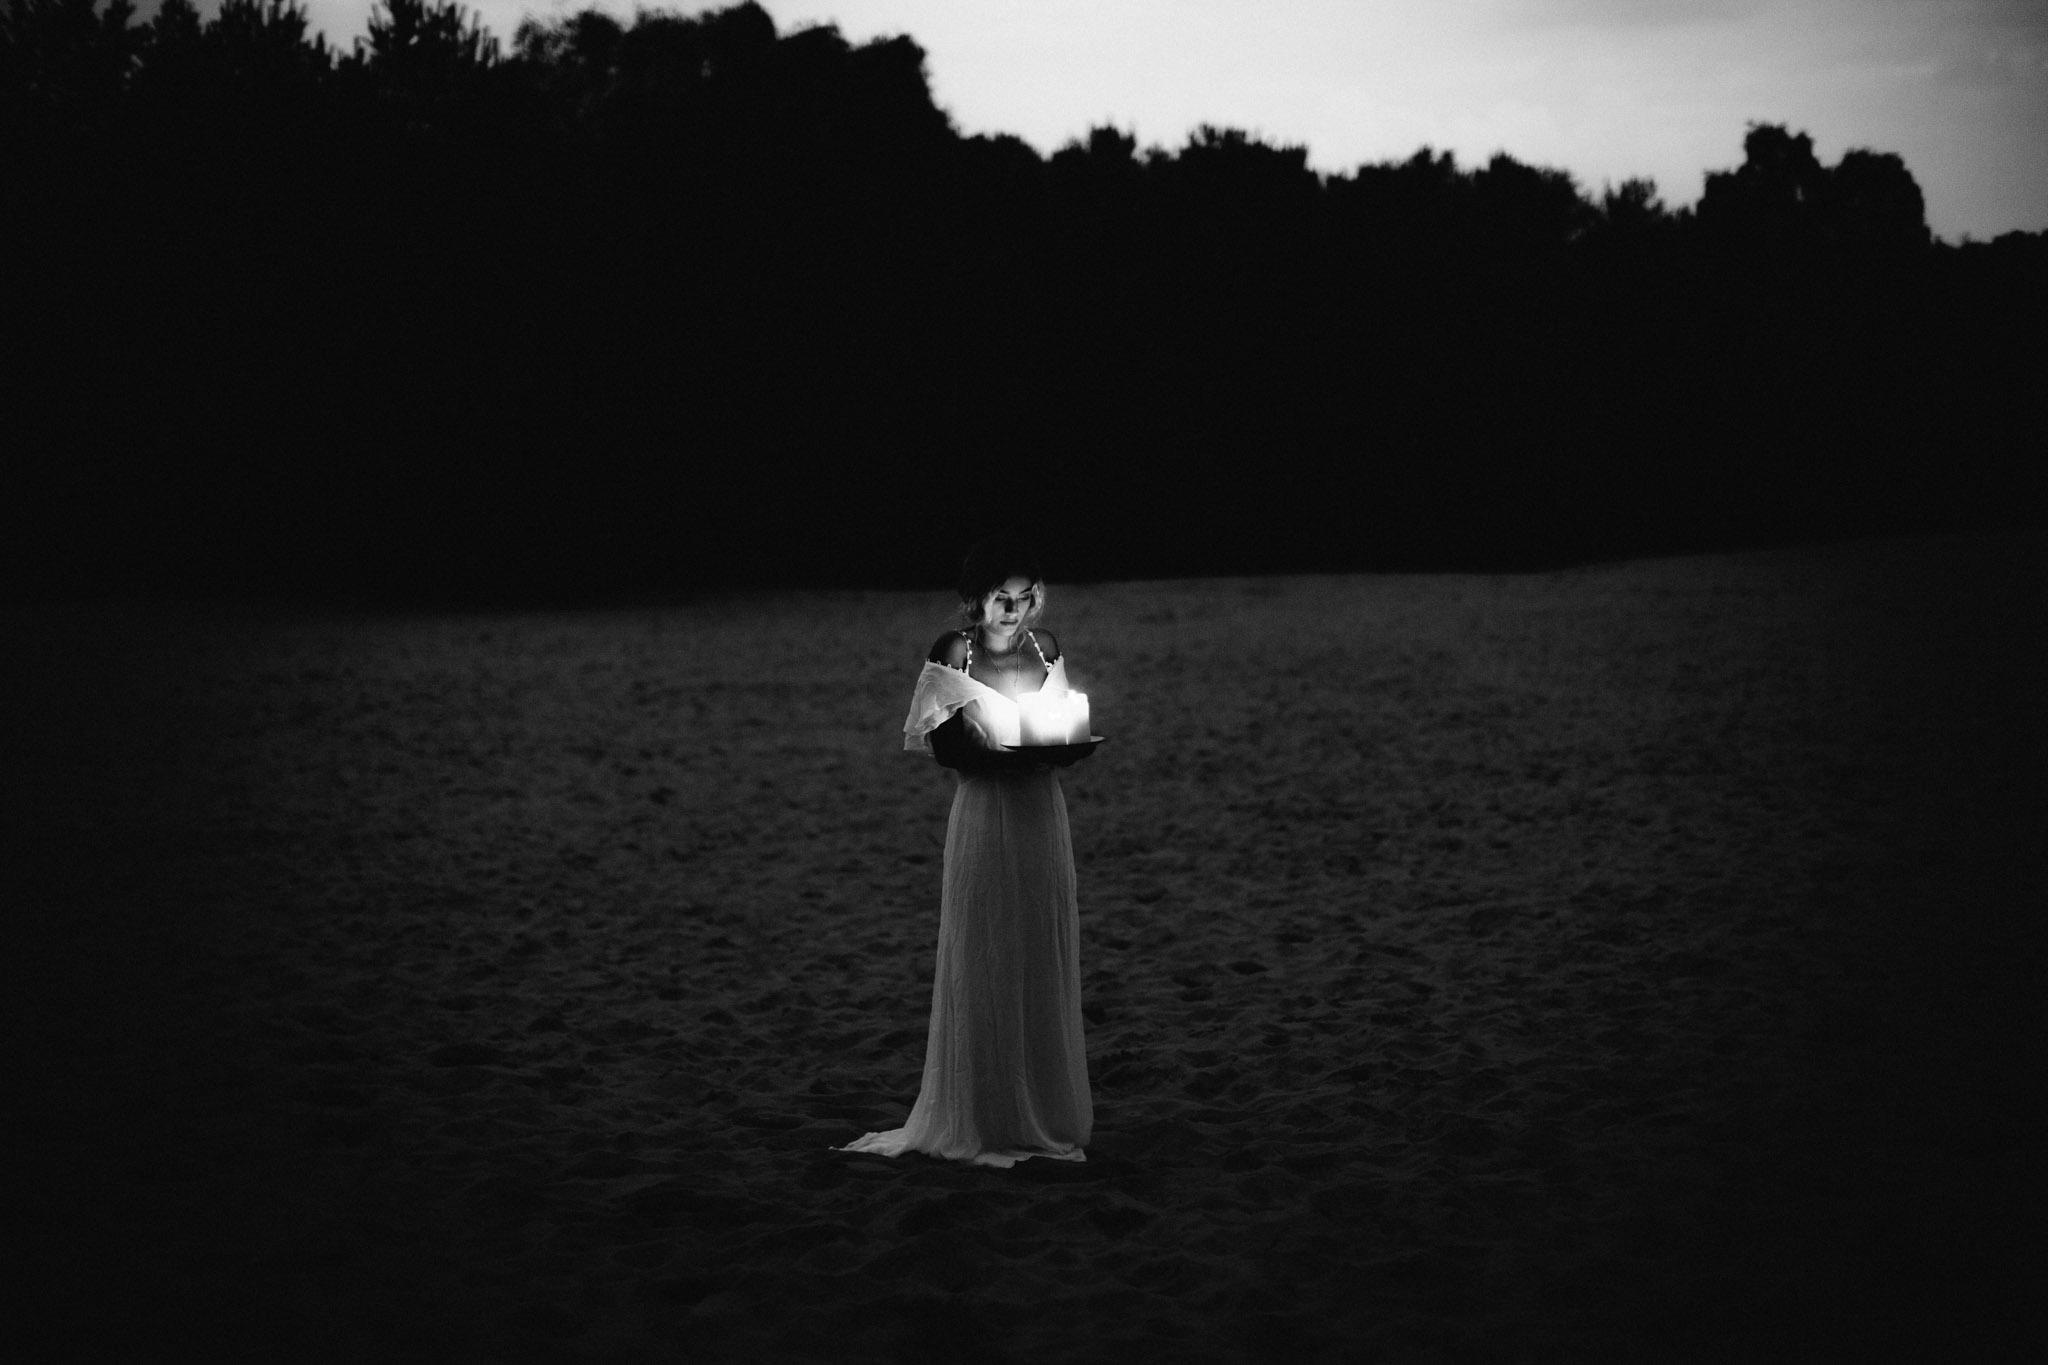 Speyer-Moroccan-Wedding-Inspiration-Pia-Anna-Christian-Wedding-Photography-S-92.jpg